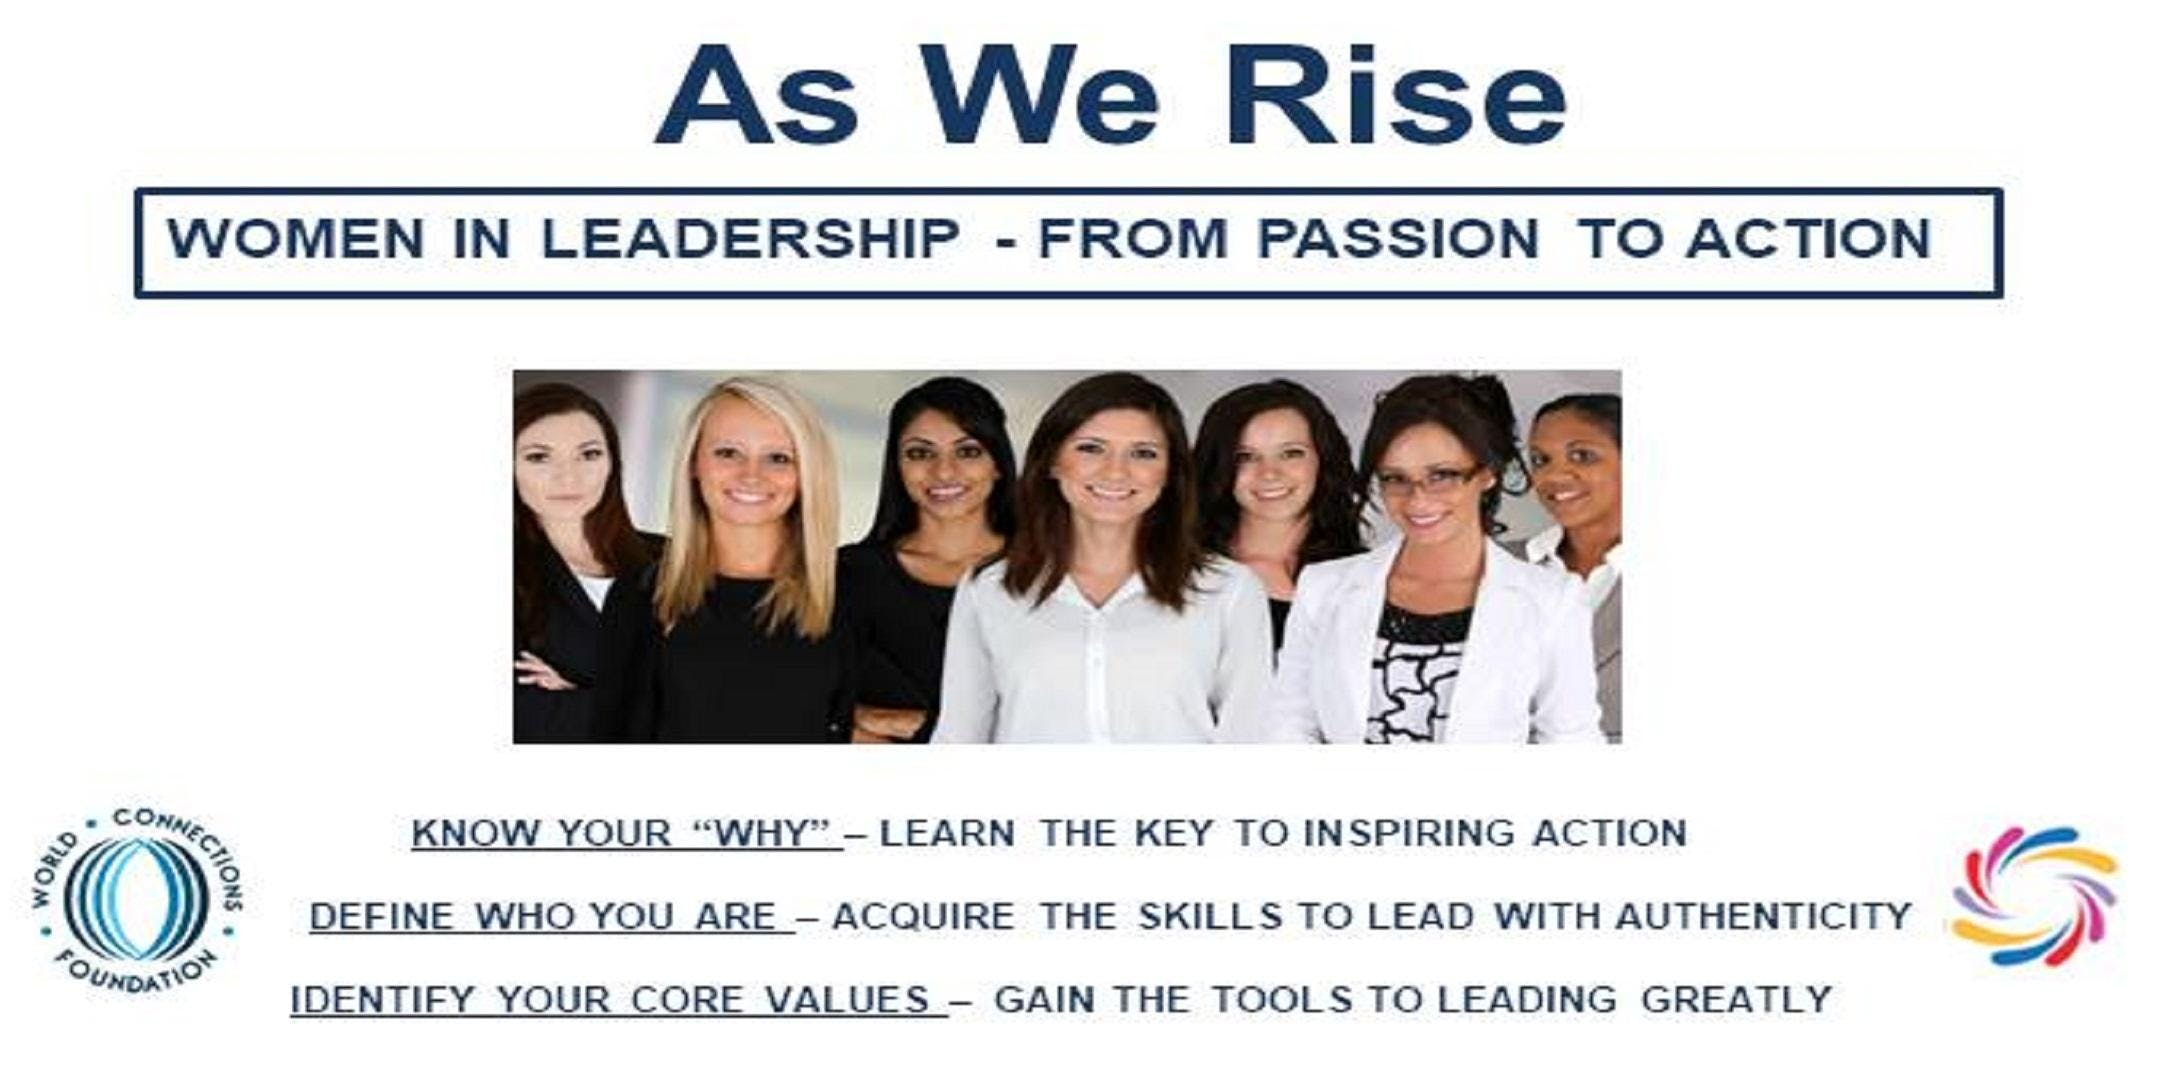 As I Rise Women's Leadership Seminar